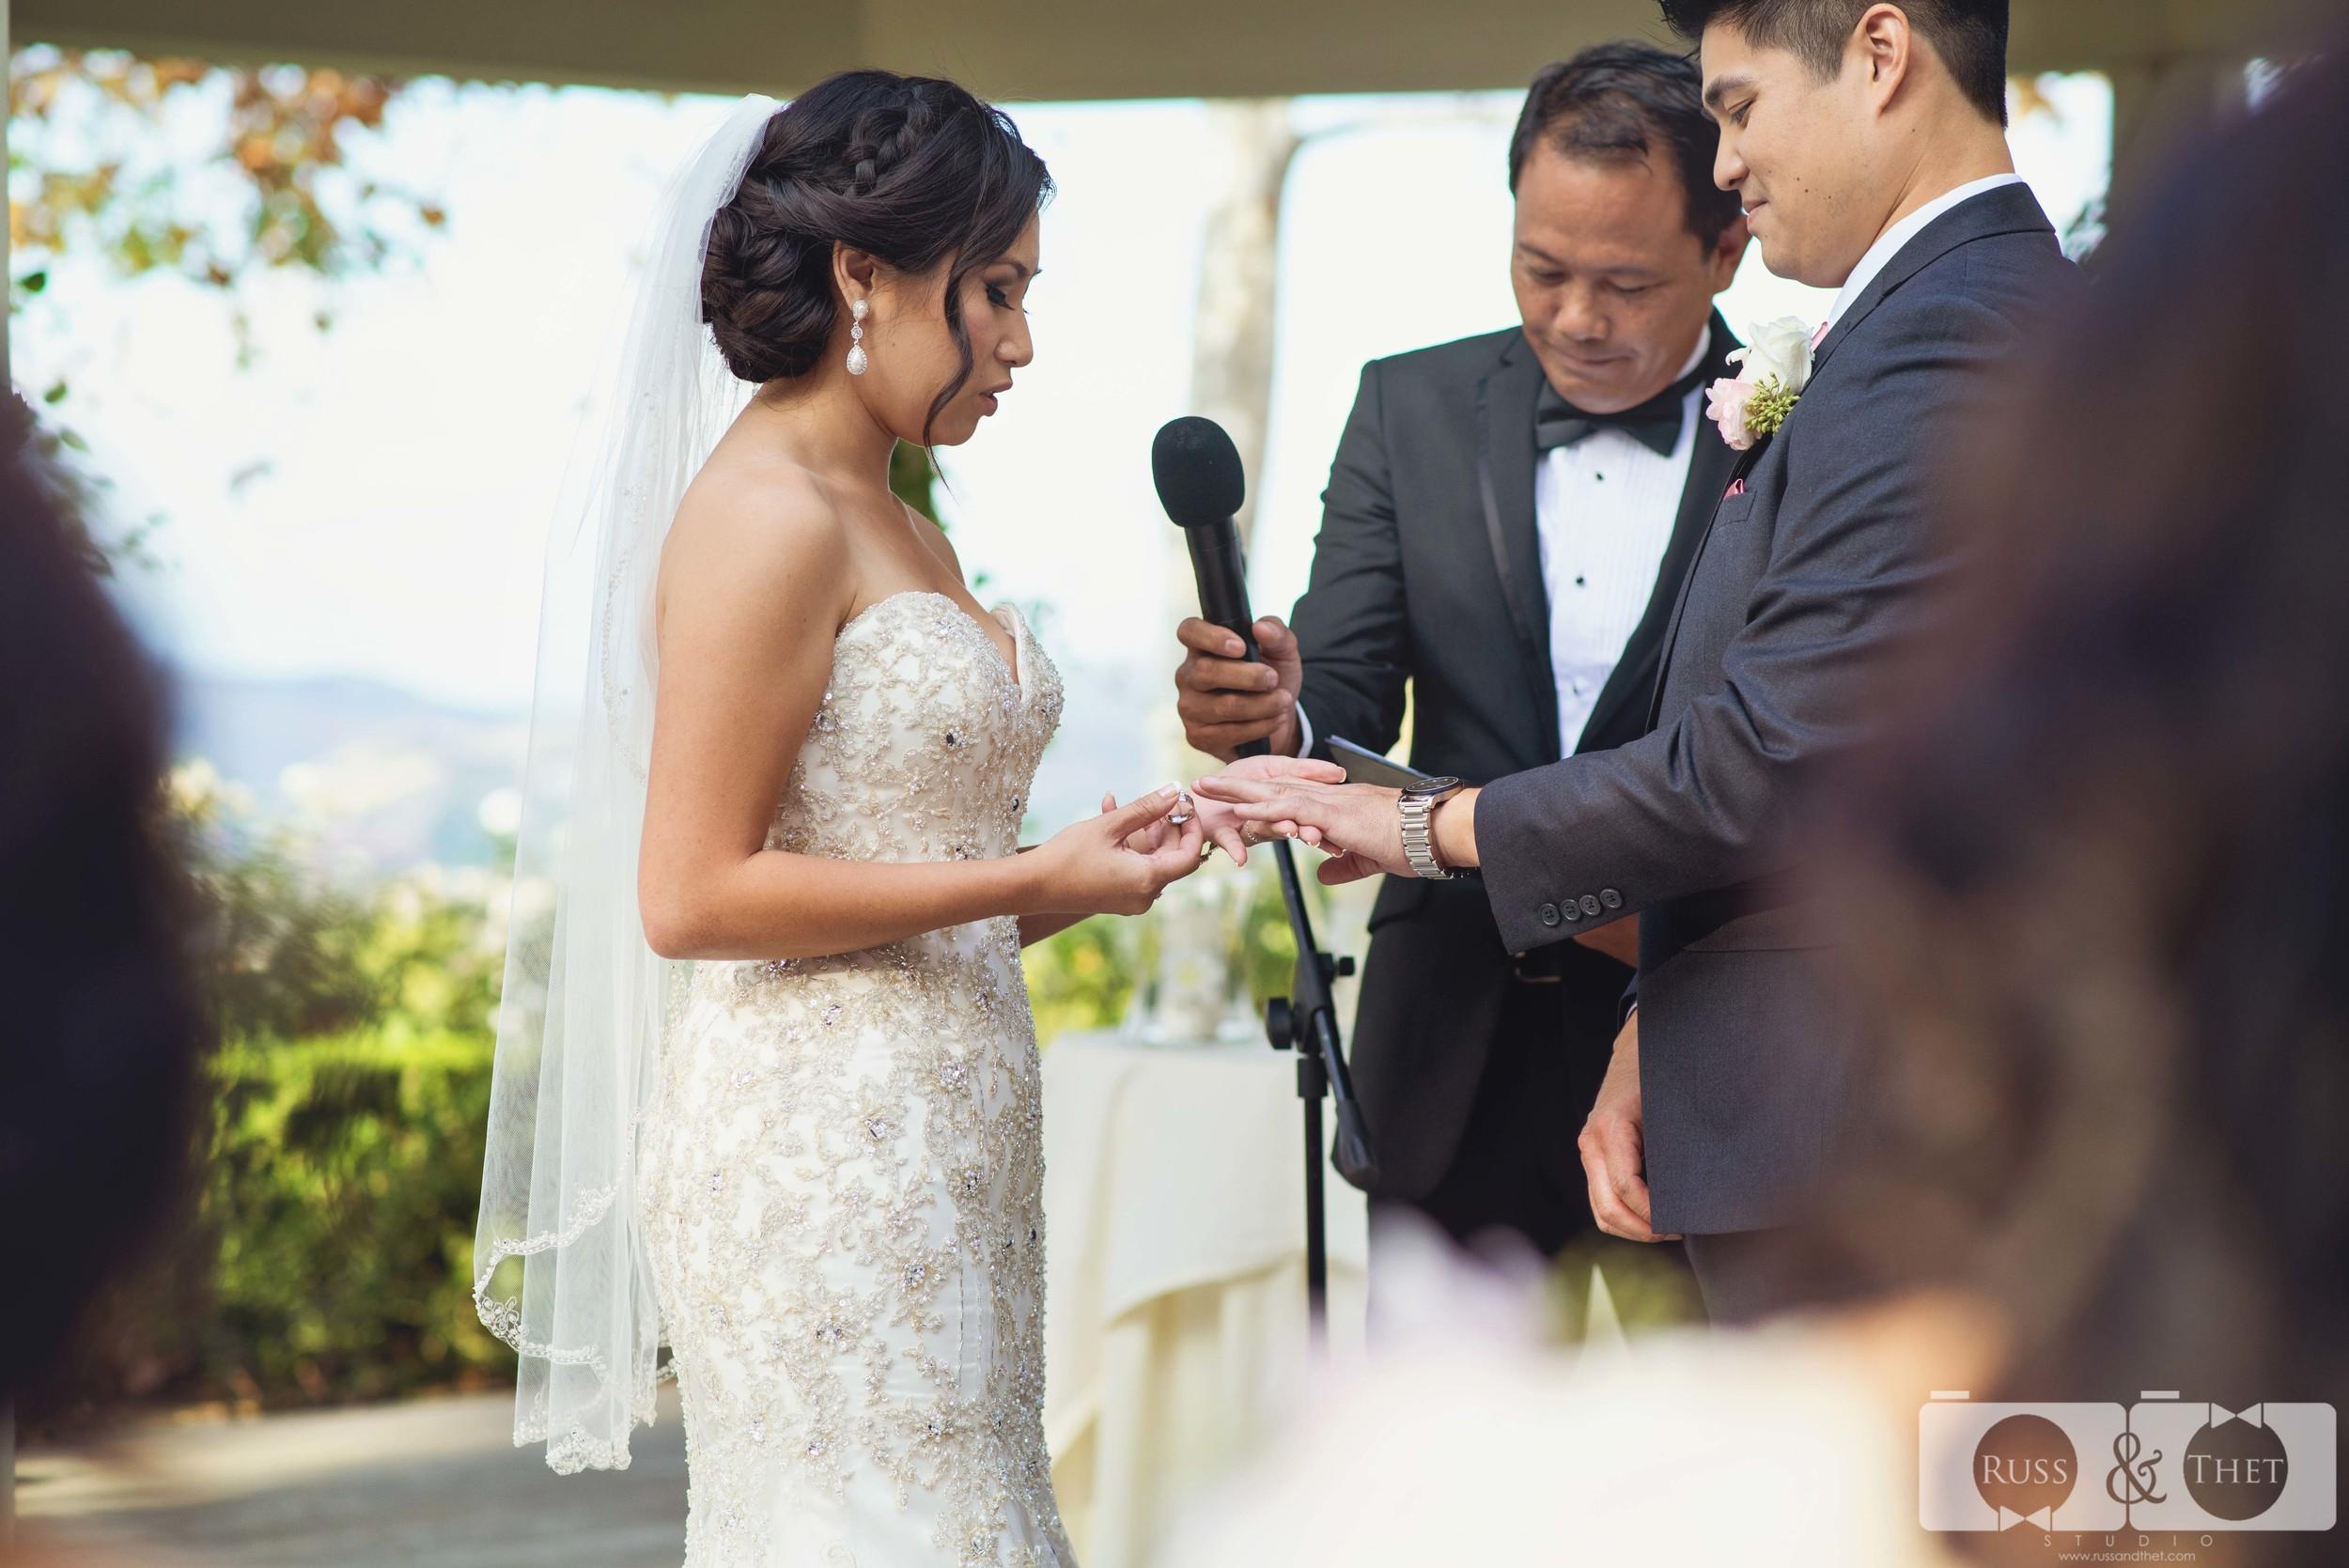 summit-house-fullerton-wedding-photographer-88.JPG